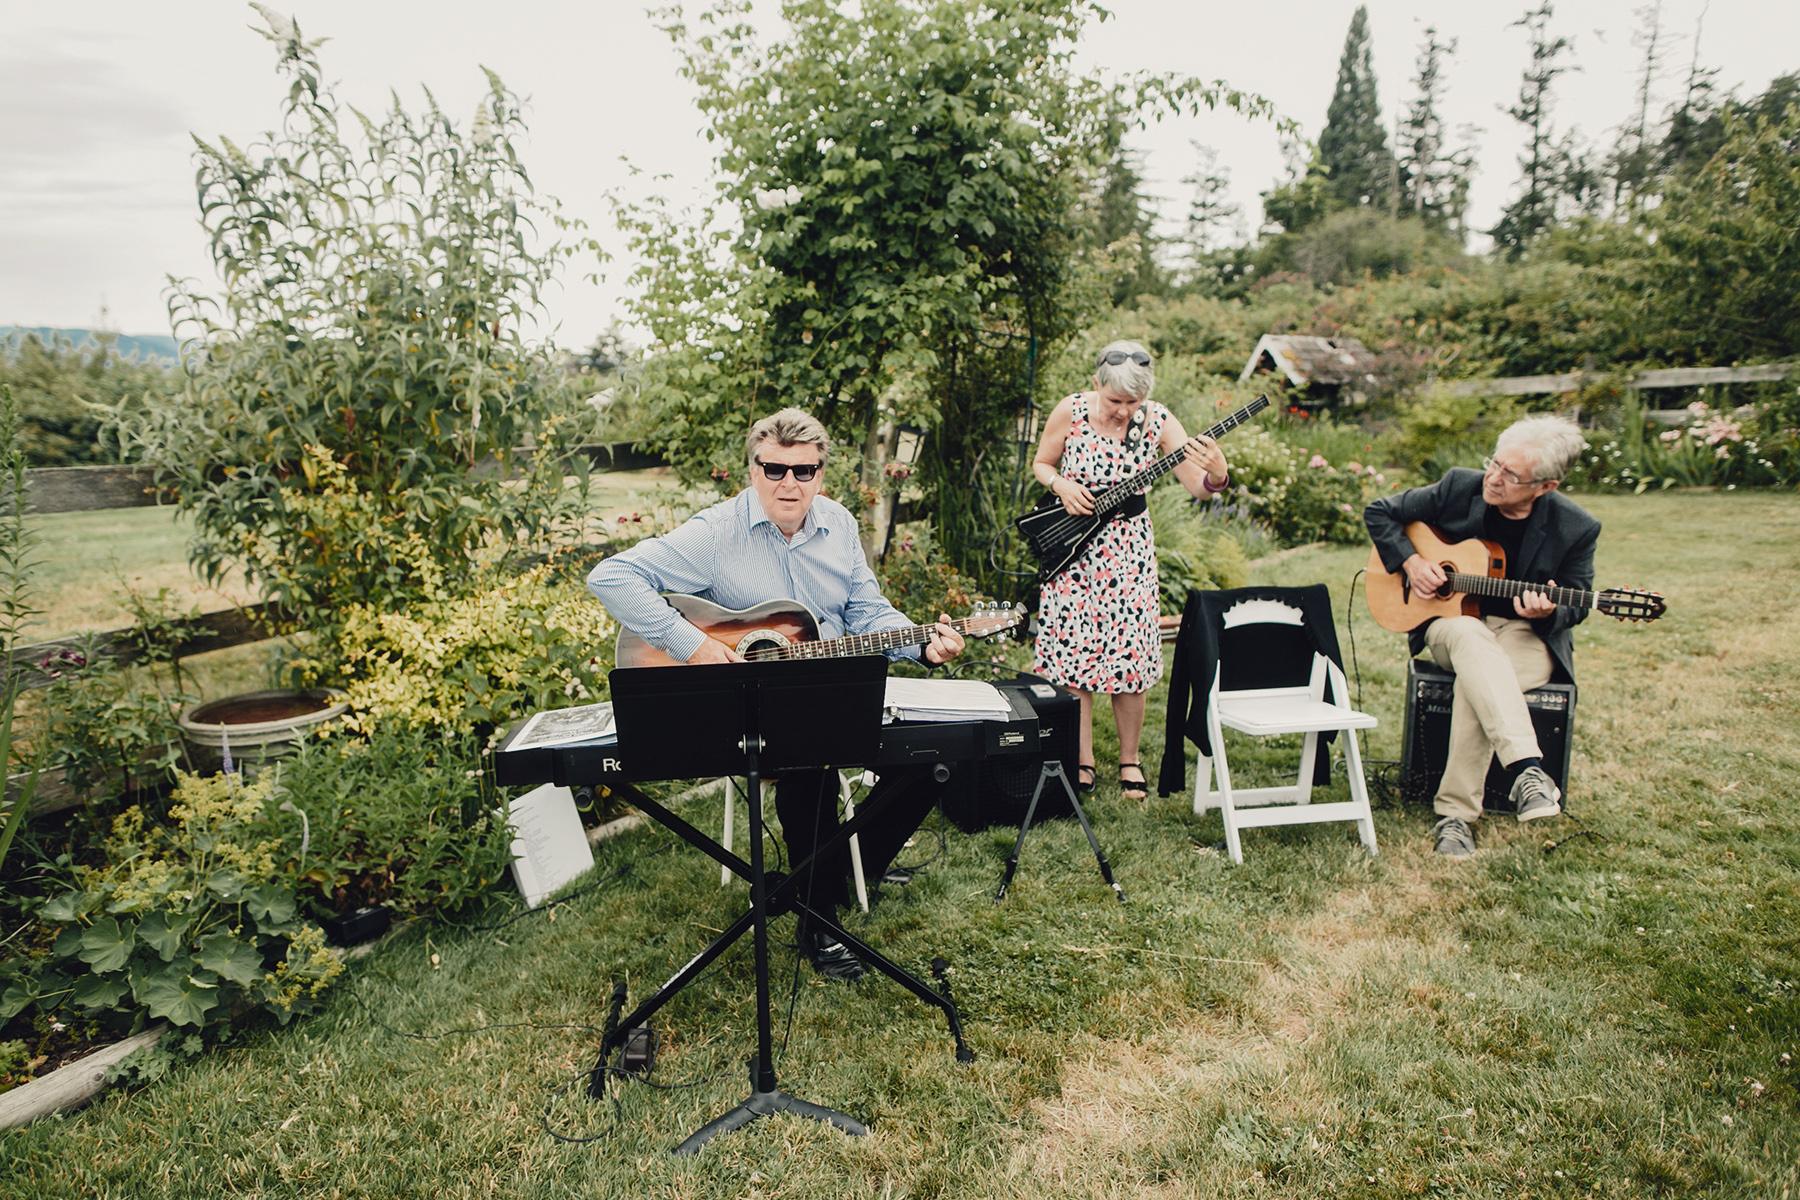 kildara-farms-wedding-photo-inspiration-0027